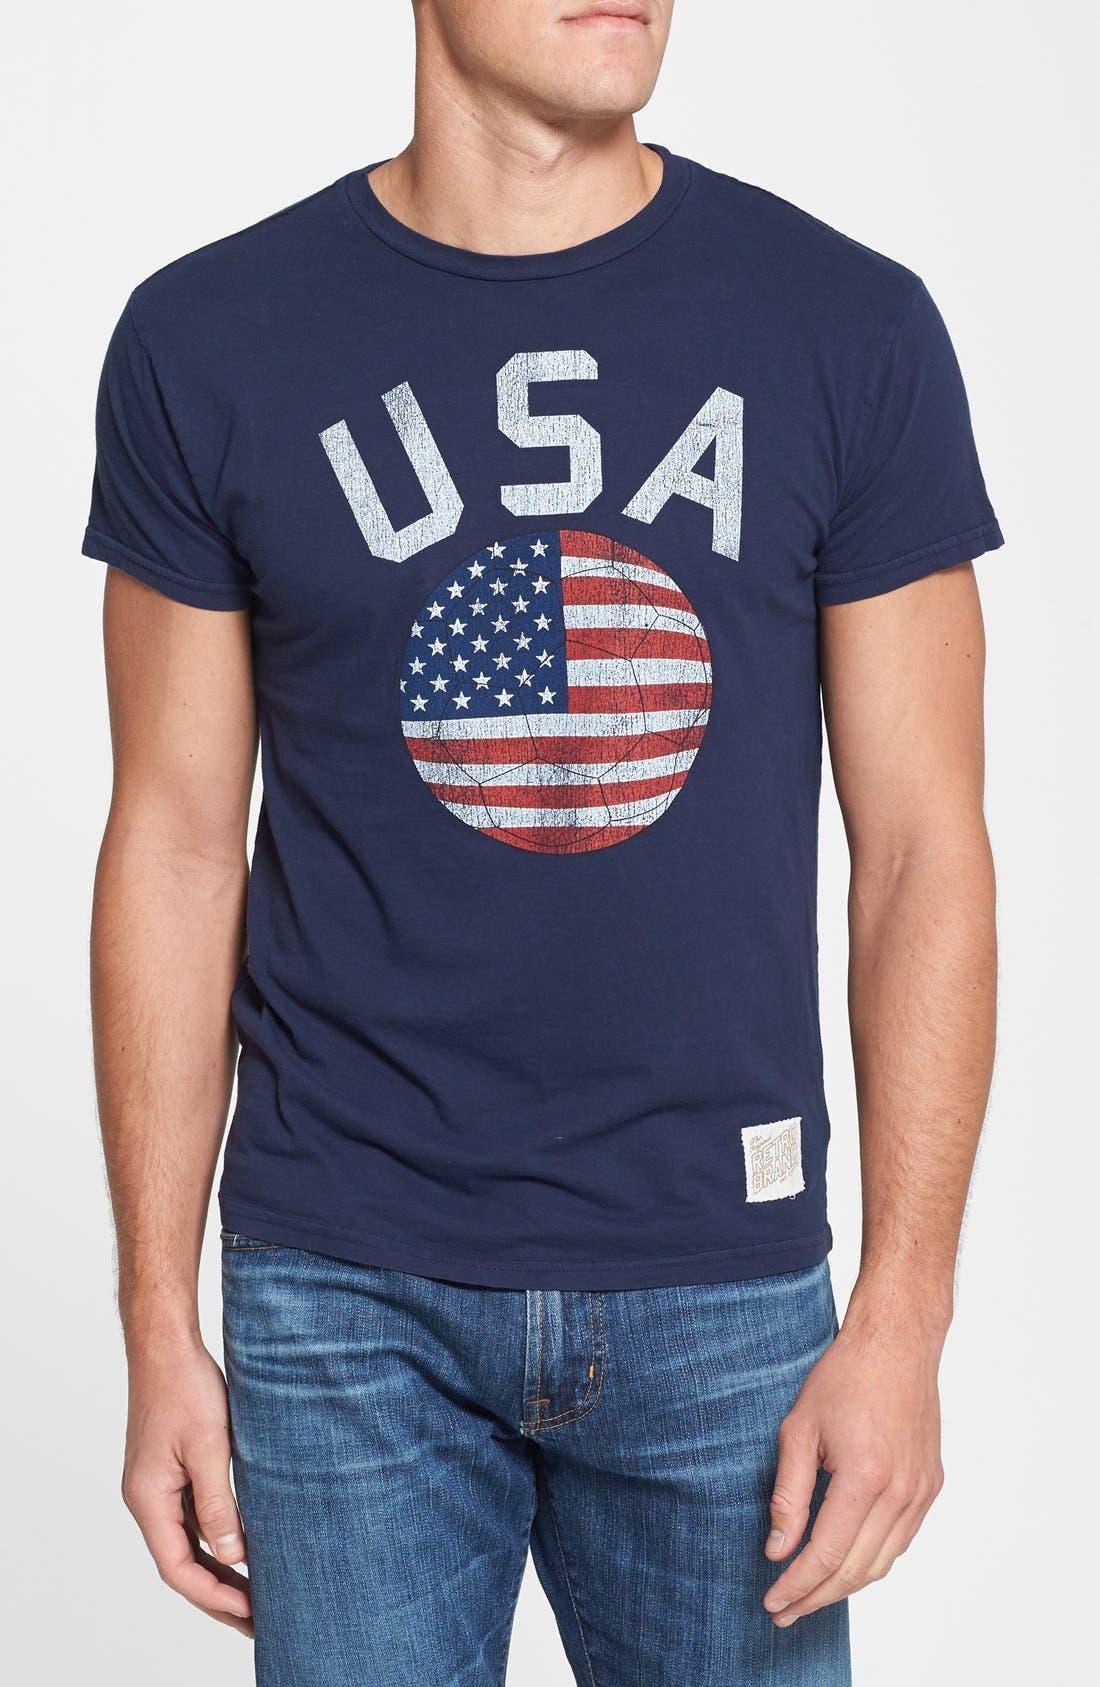 Alternate Image 1 Selected - Retro Brand 'USA Soccer' Slim Fit T-Shirt